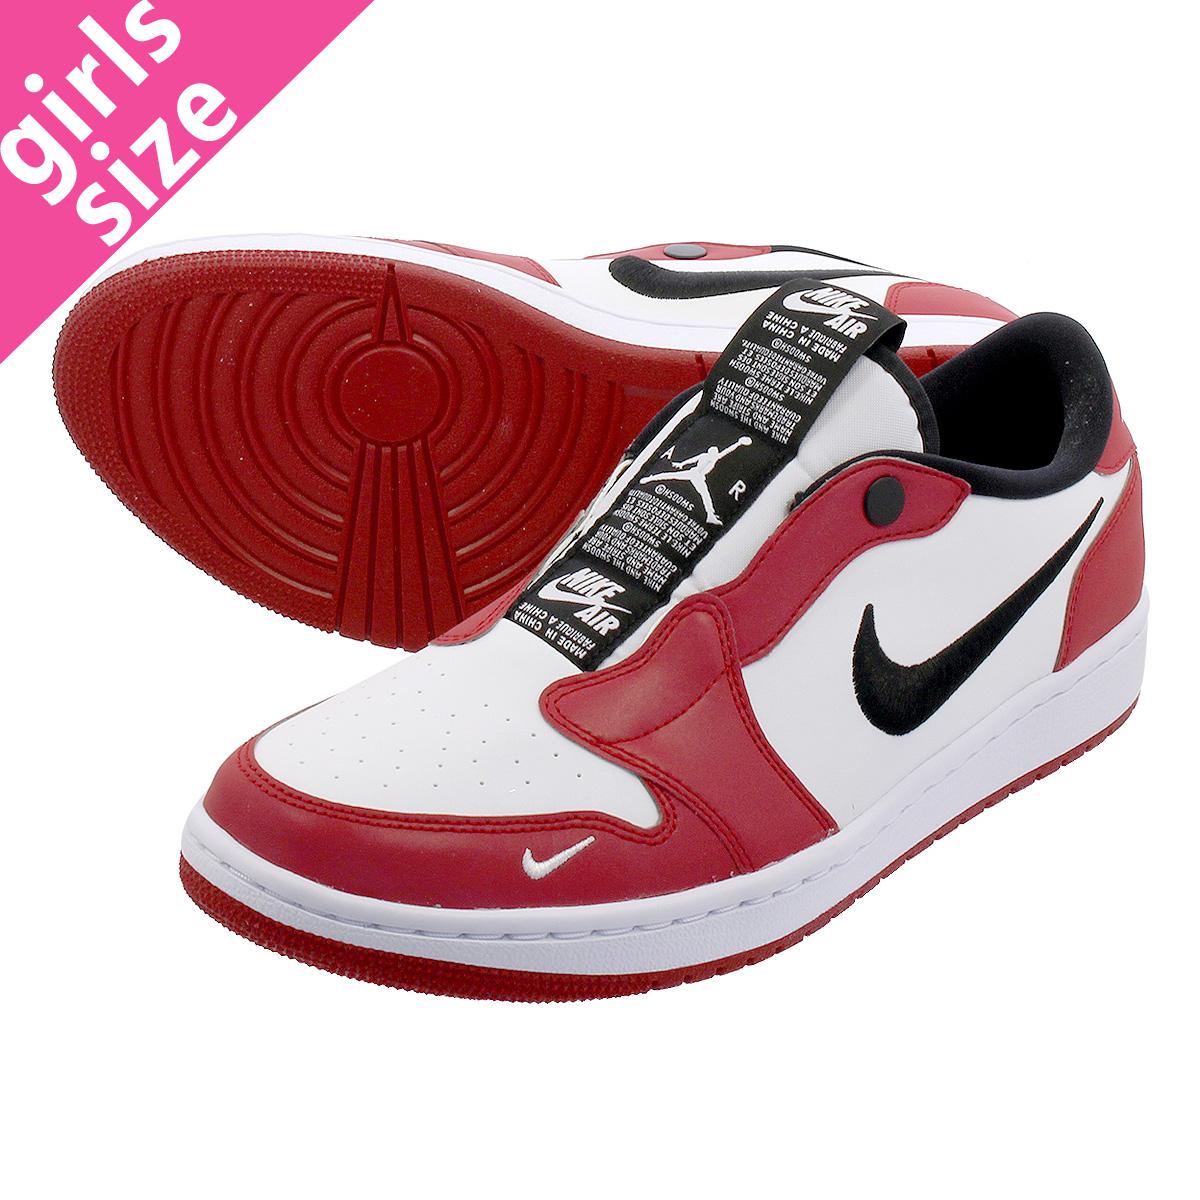 hot sales fa117 528d5 NIKE WMNS AIR JORDAN 1 SLIP Nike women Air Jordan 1 slip VARSITY  RED/BLACK/WHITE bq8462-601